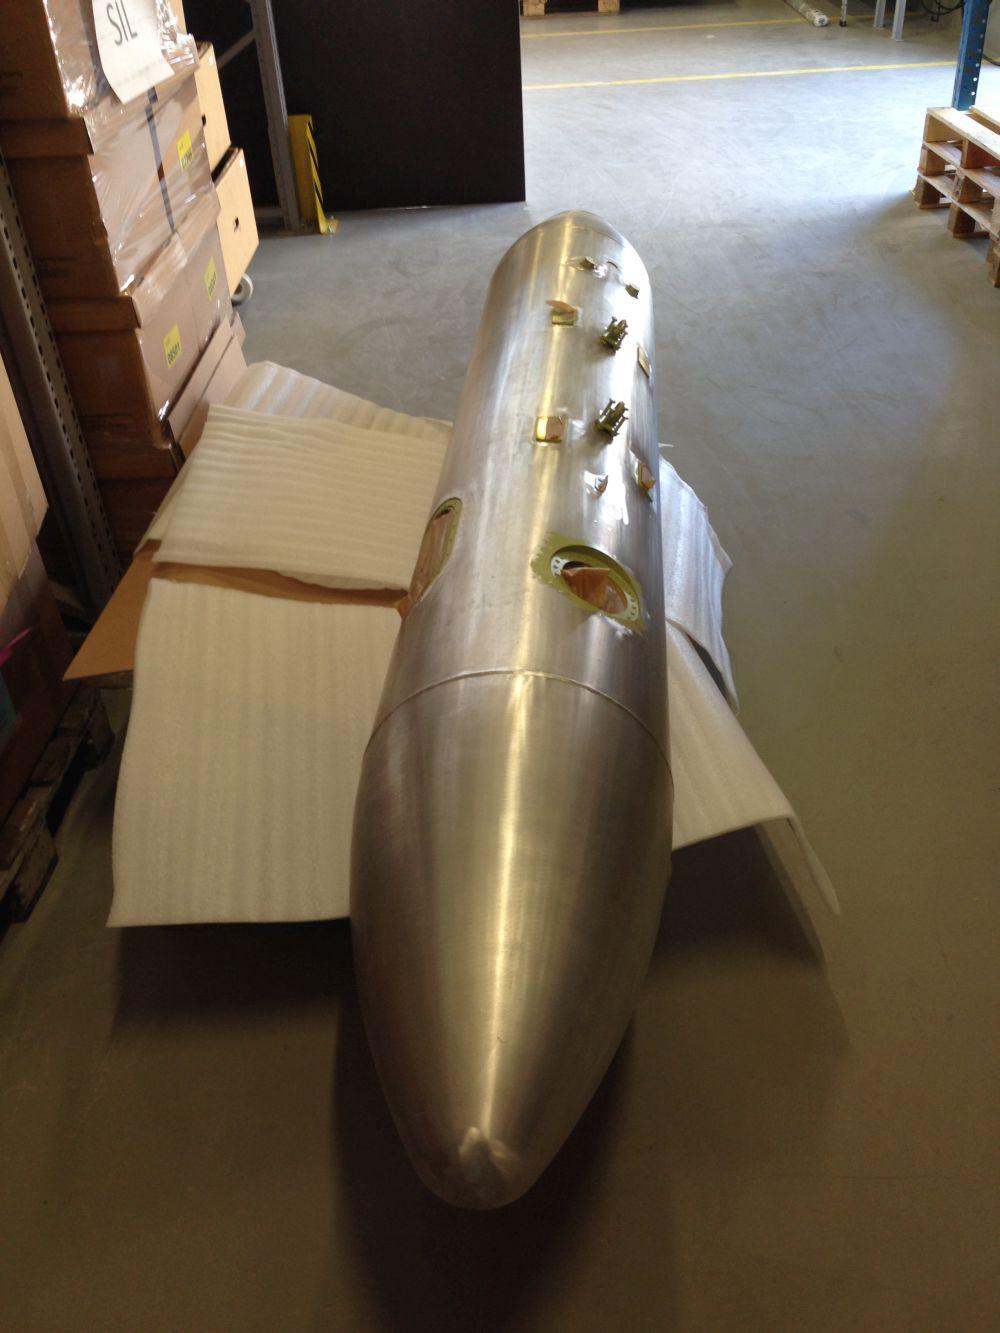 Flugzeugtank-entlacken-2